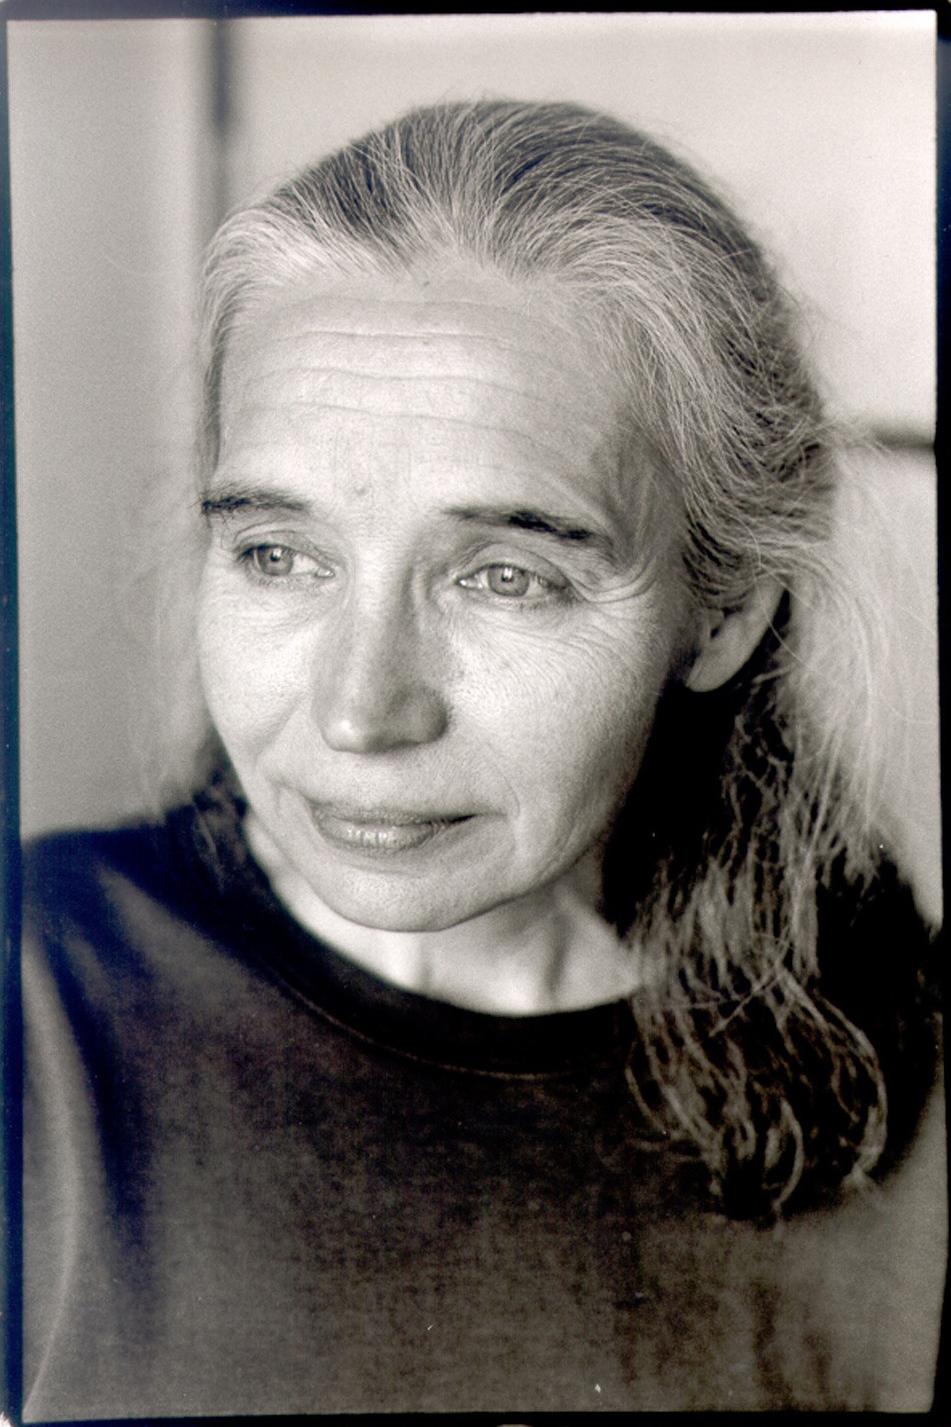 Alison Des Forges - Wikipedia